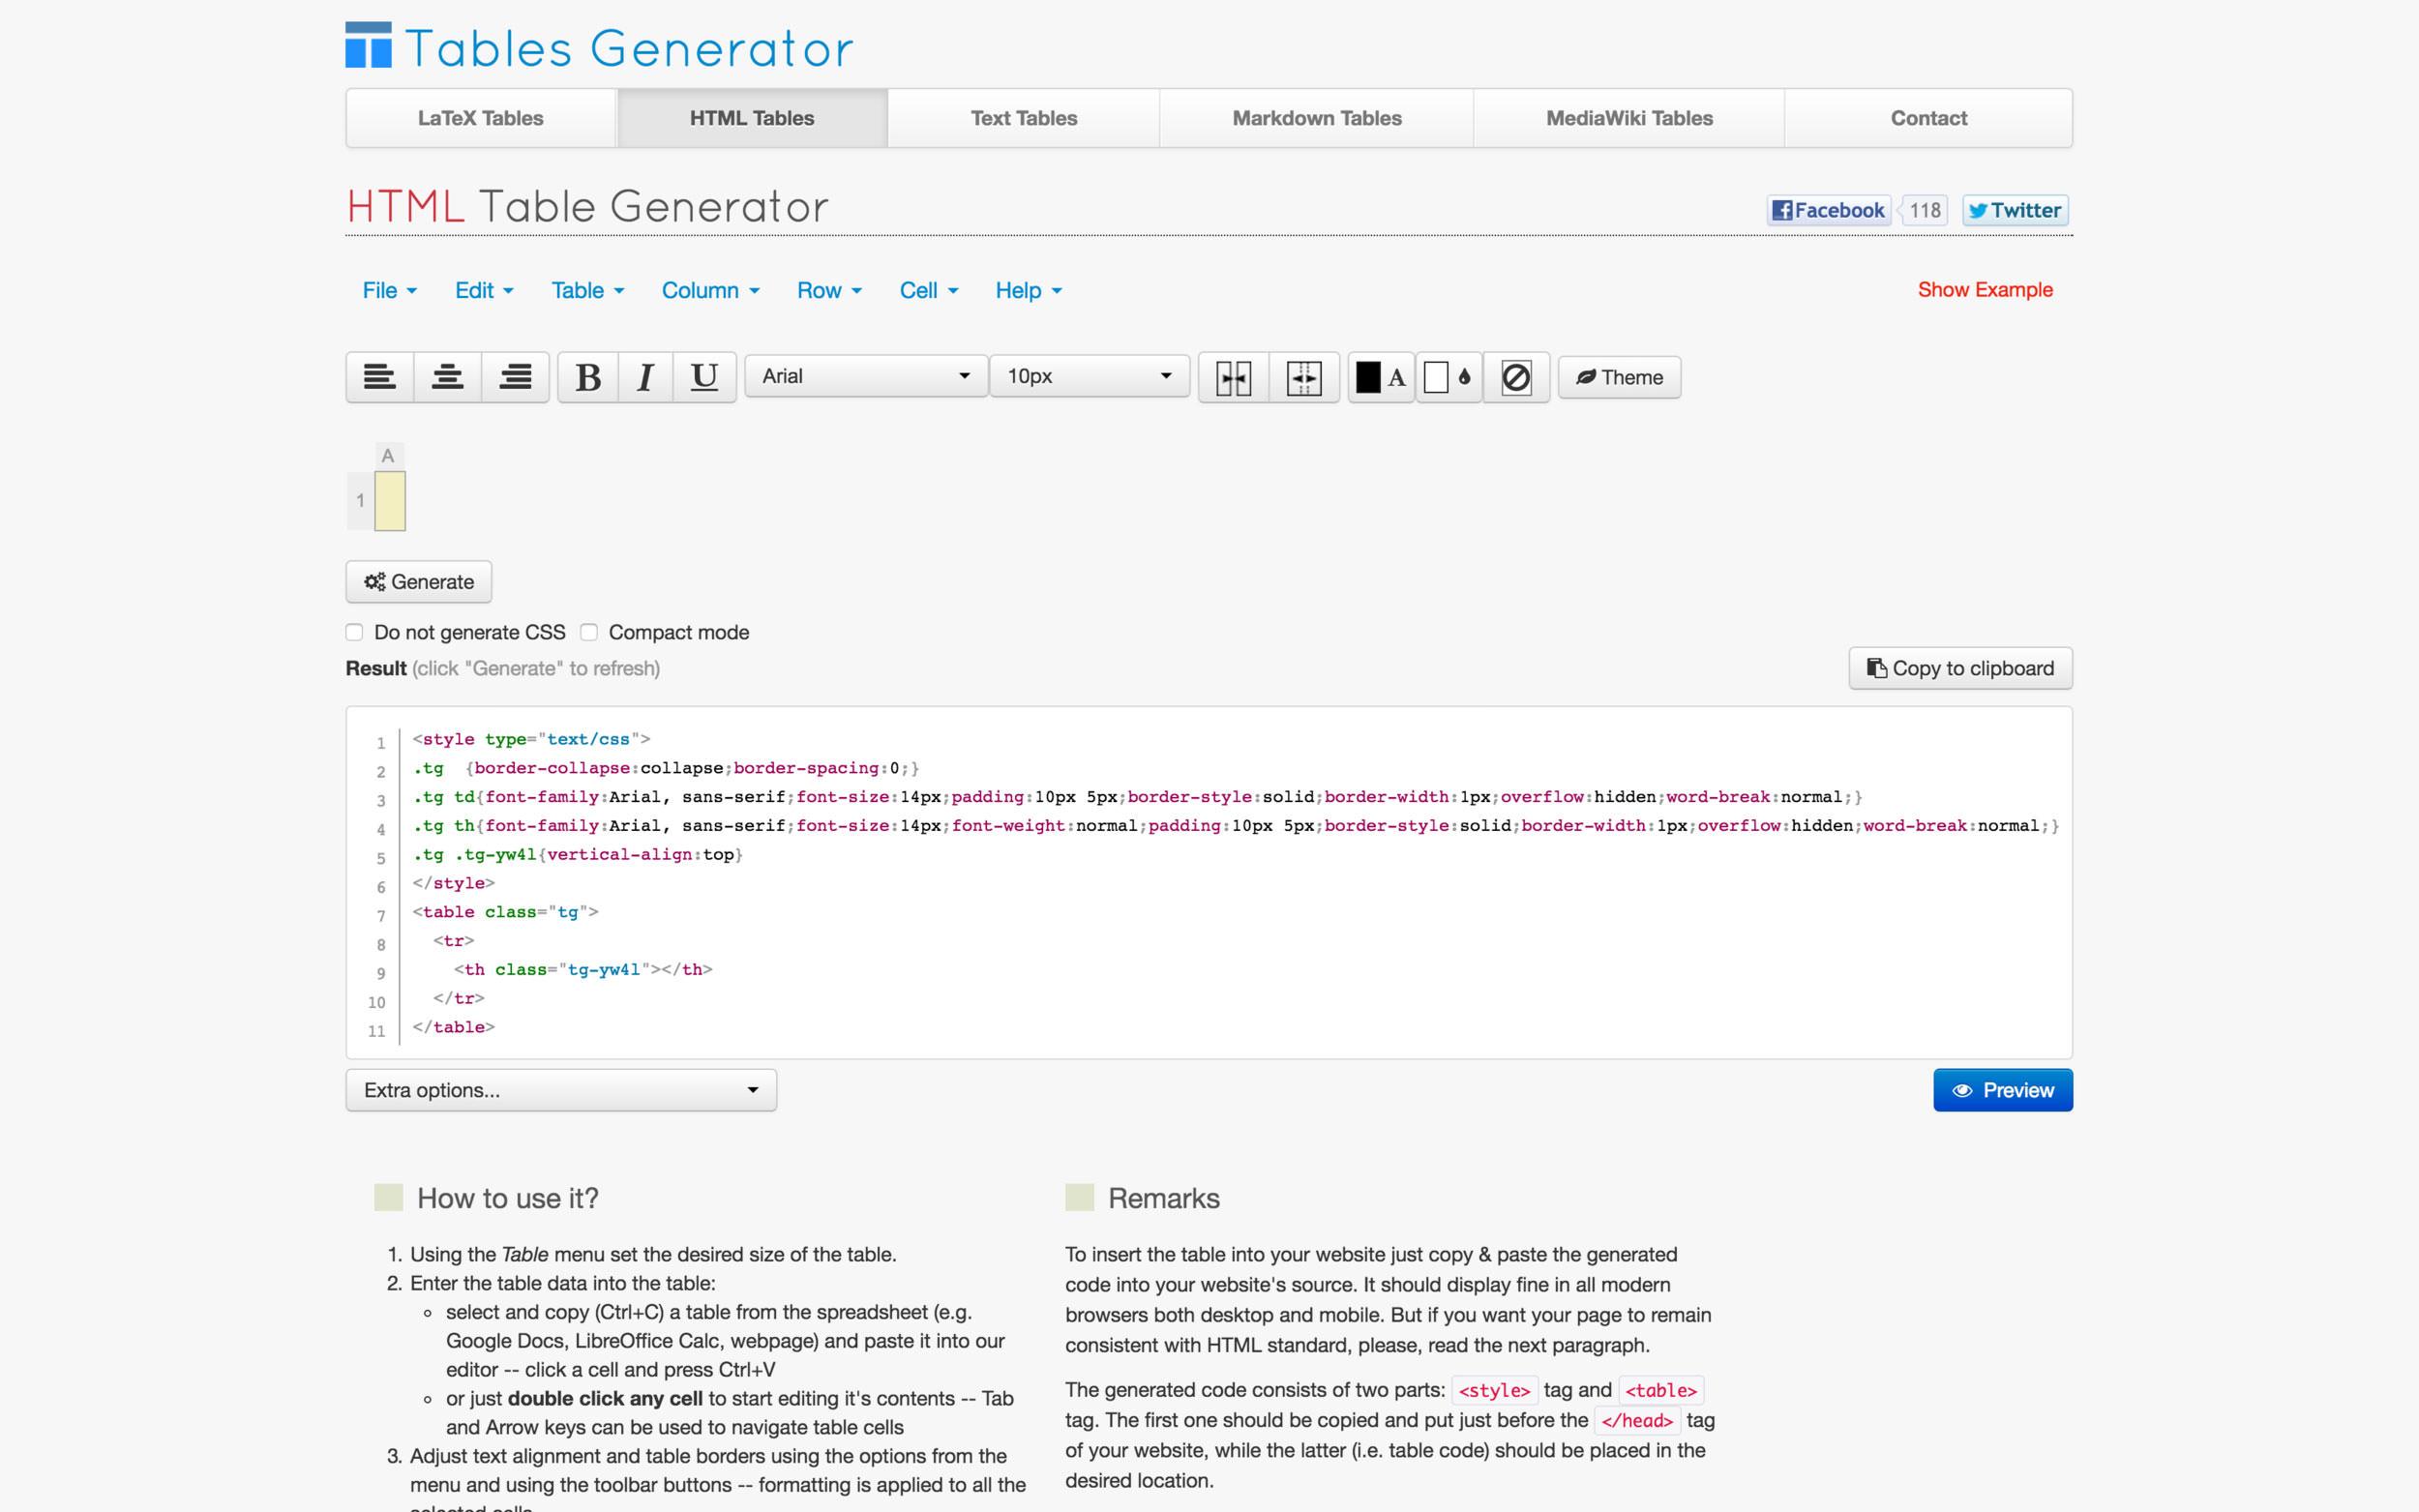 Ferramentas-para-empreendedores-TablesGenerator.jpg